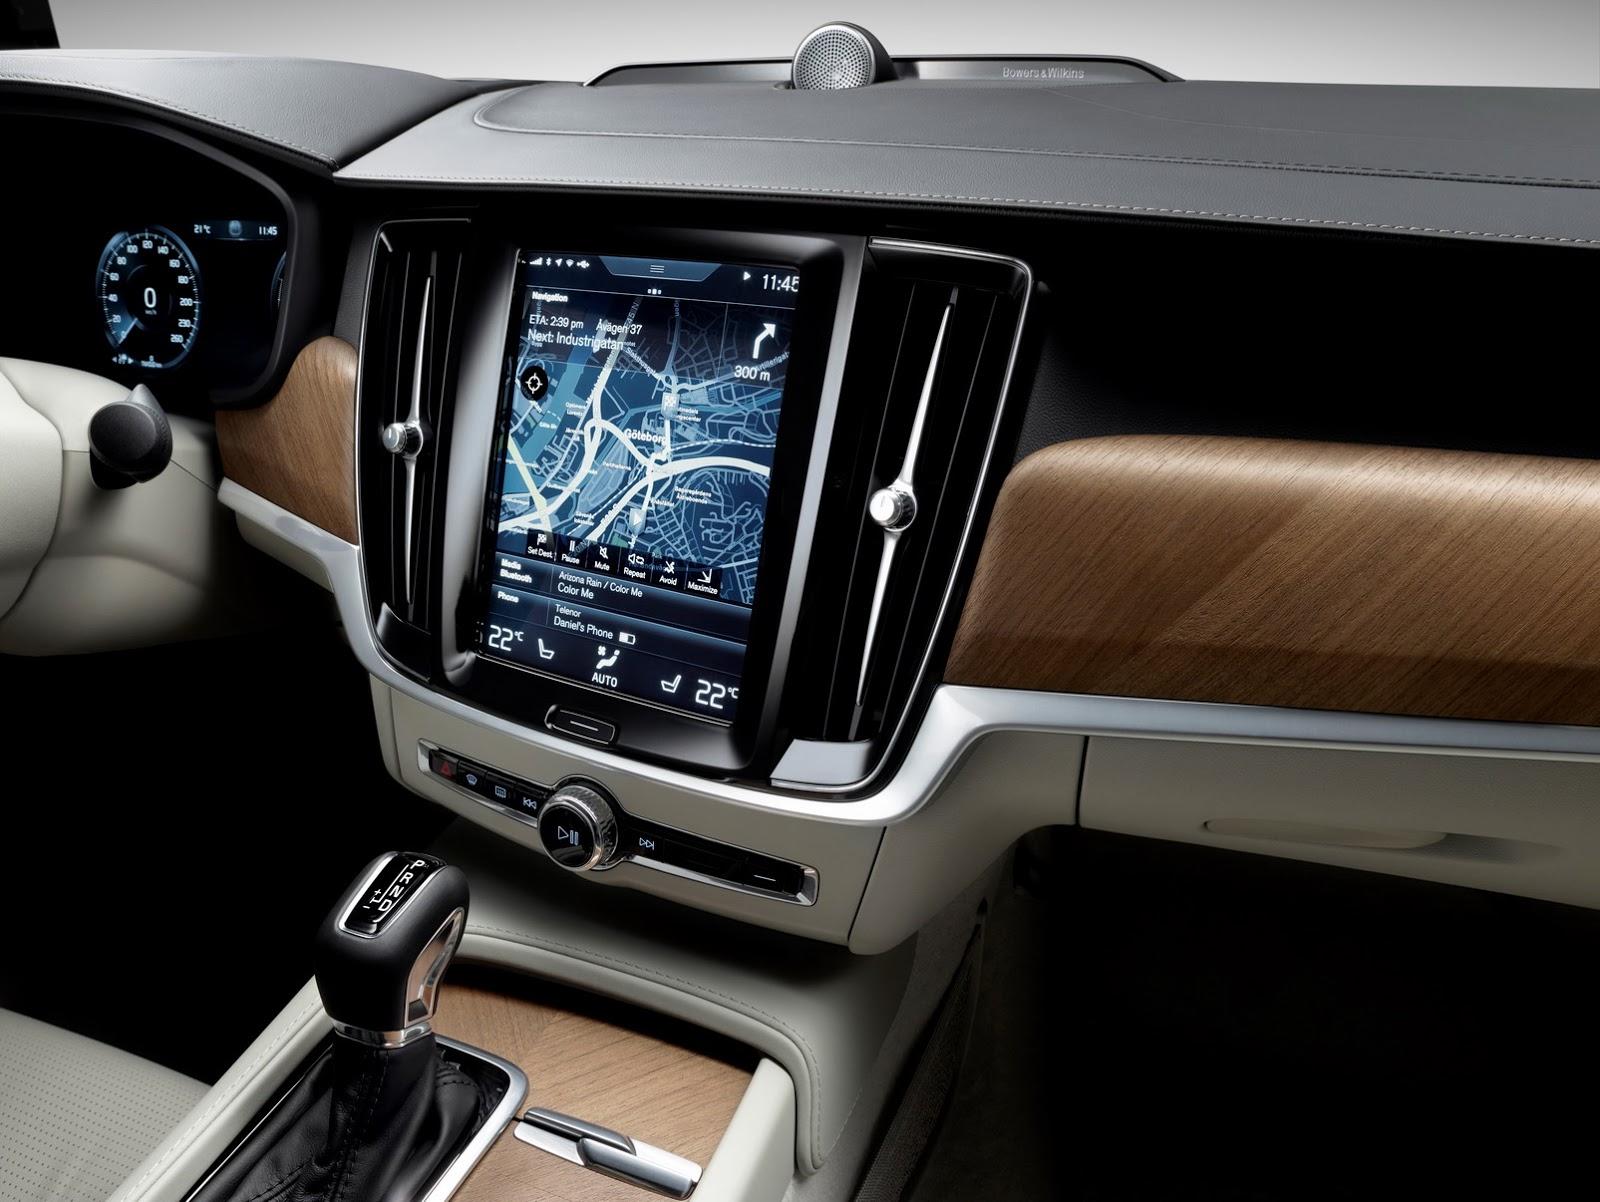 2016 Volvo V90 Leaks Ahead of Geneva Motor Show Debut ...